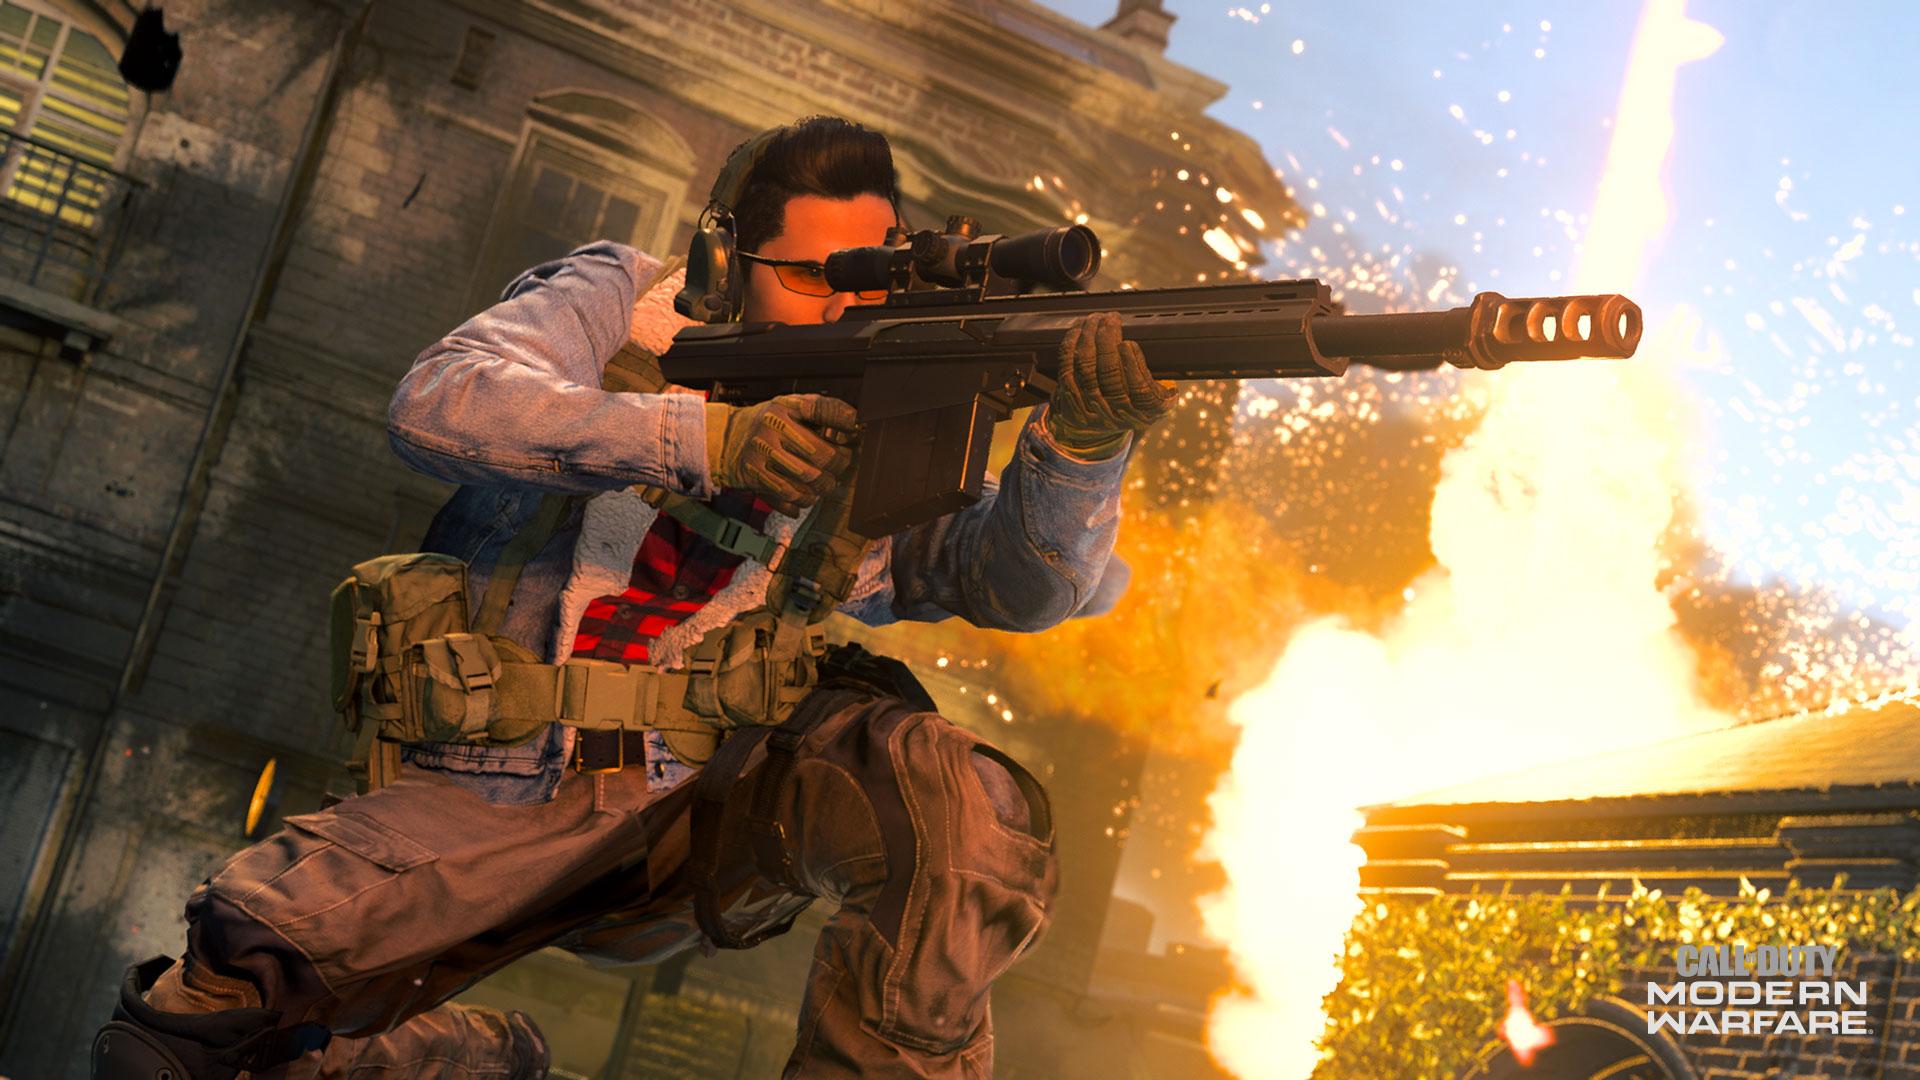 Hot shot sniper 2 game sault tribe casino